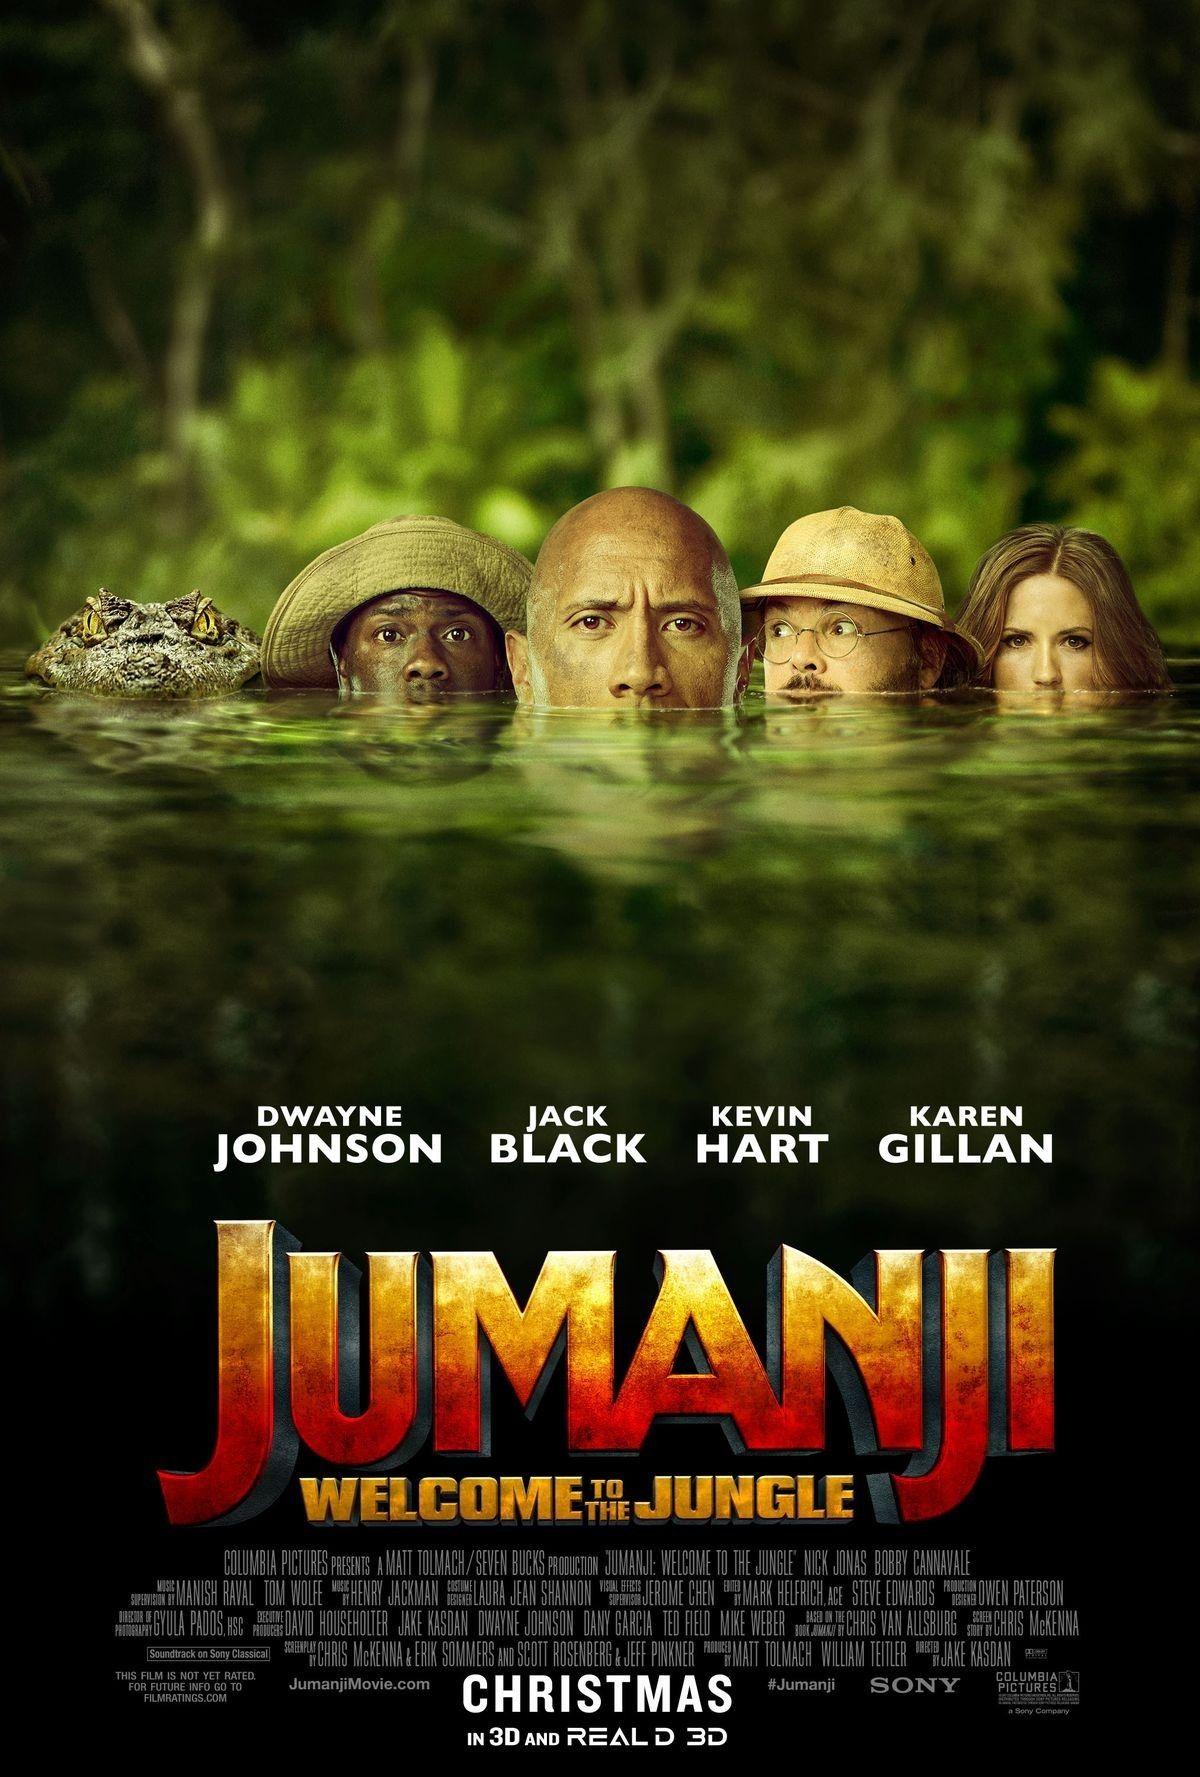 Jumanji Dwayne Johnson Jack Black Kevin Hart And Karen Gillan 2017 Film